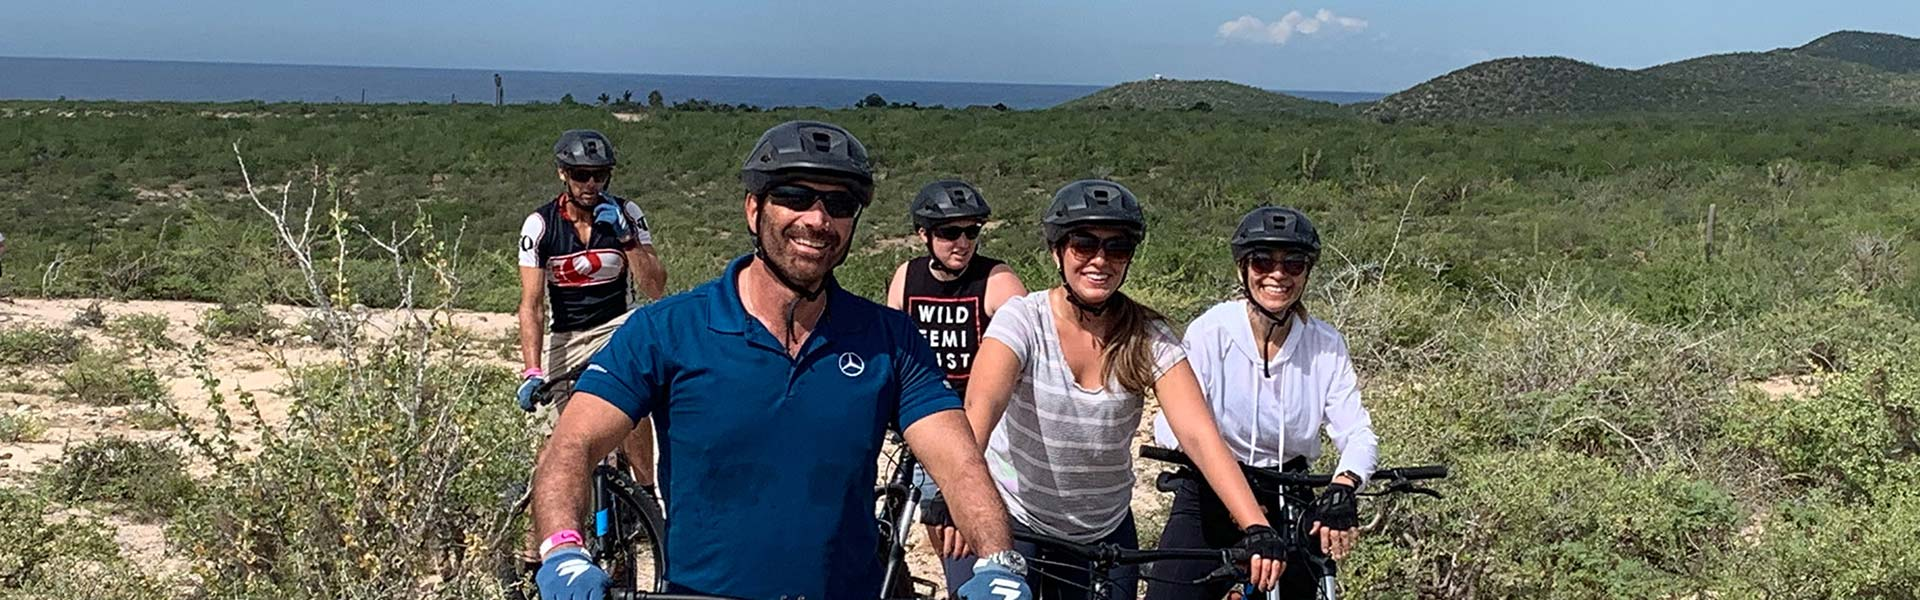 group biking in nature